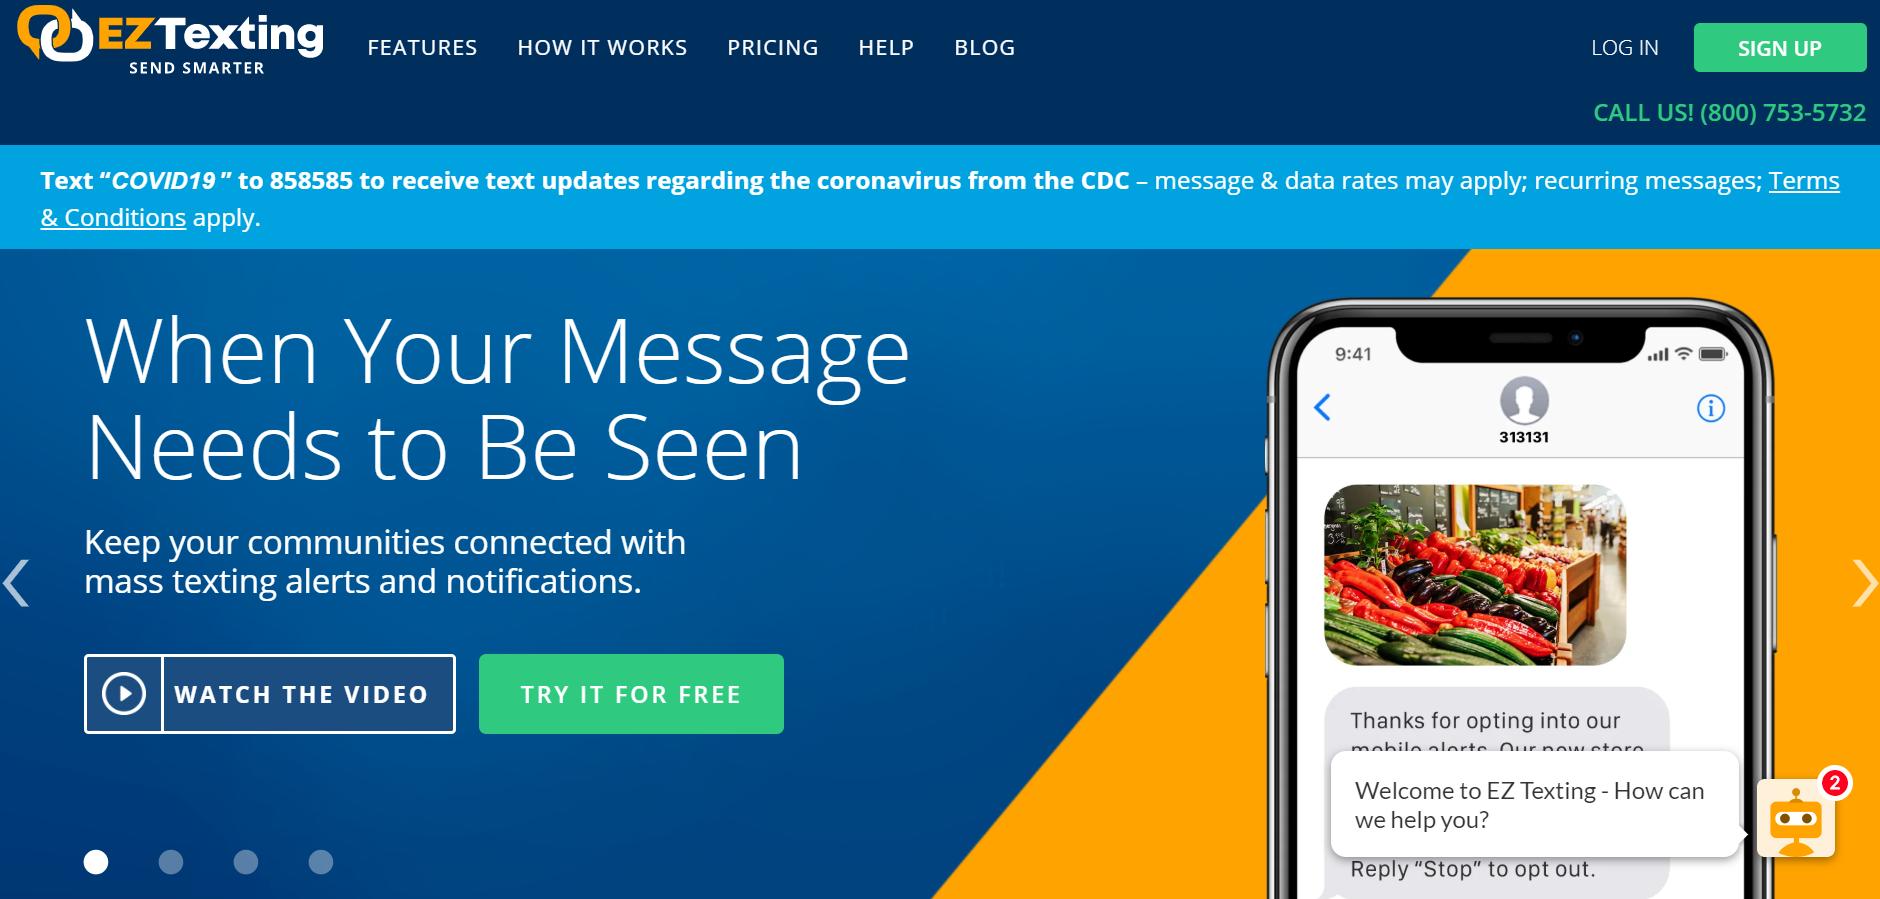 best SMS marketing services - EZ Texting